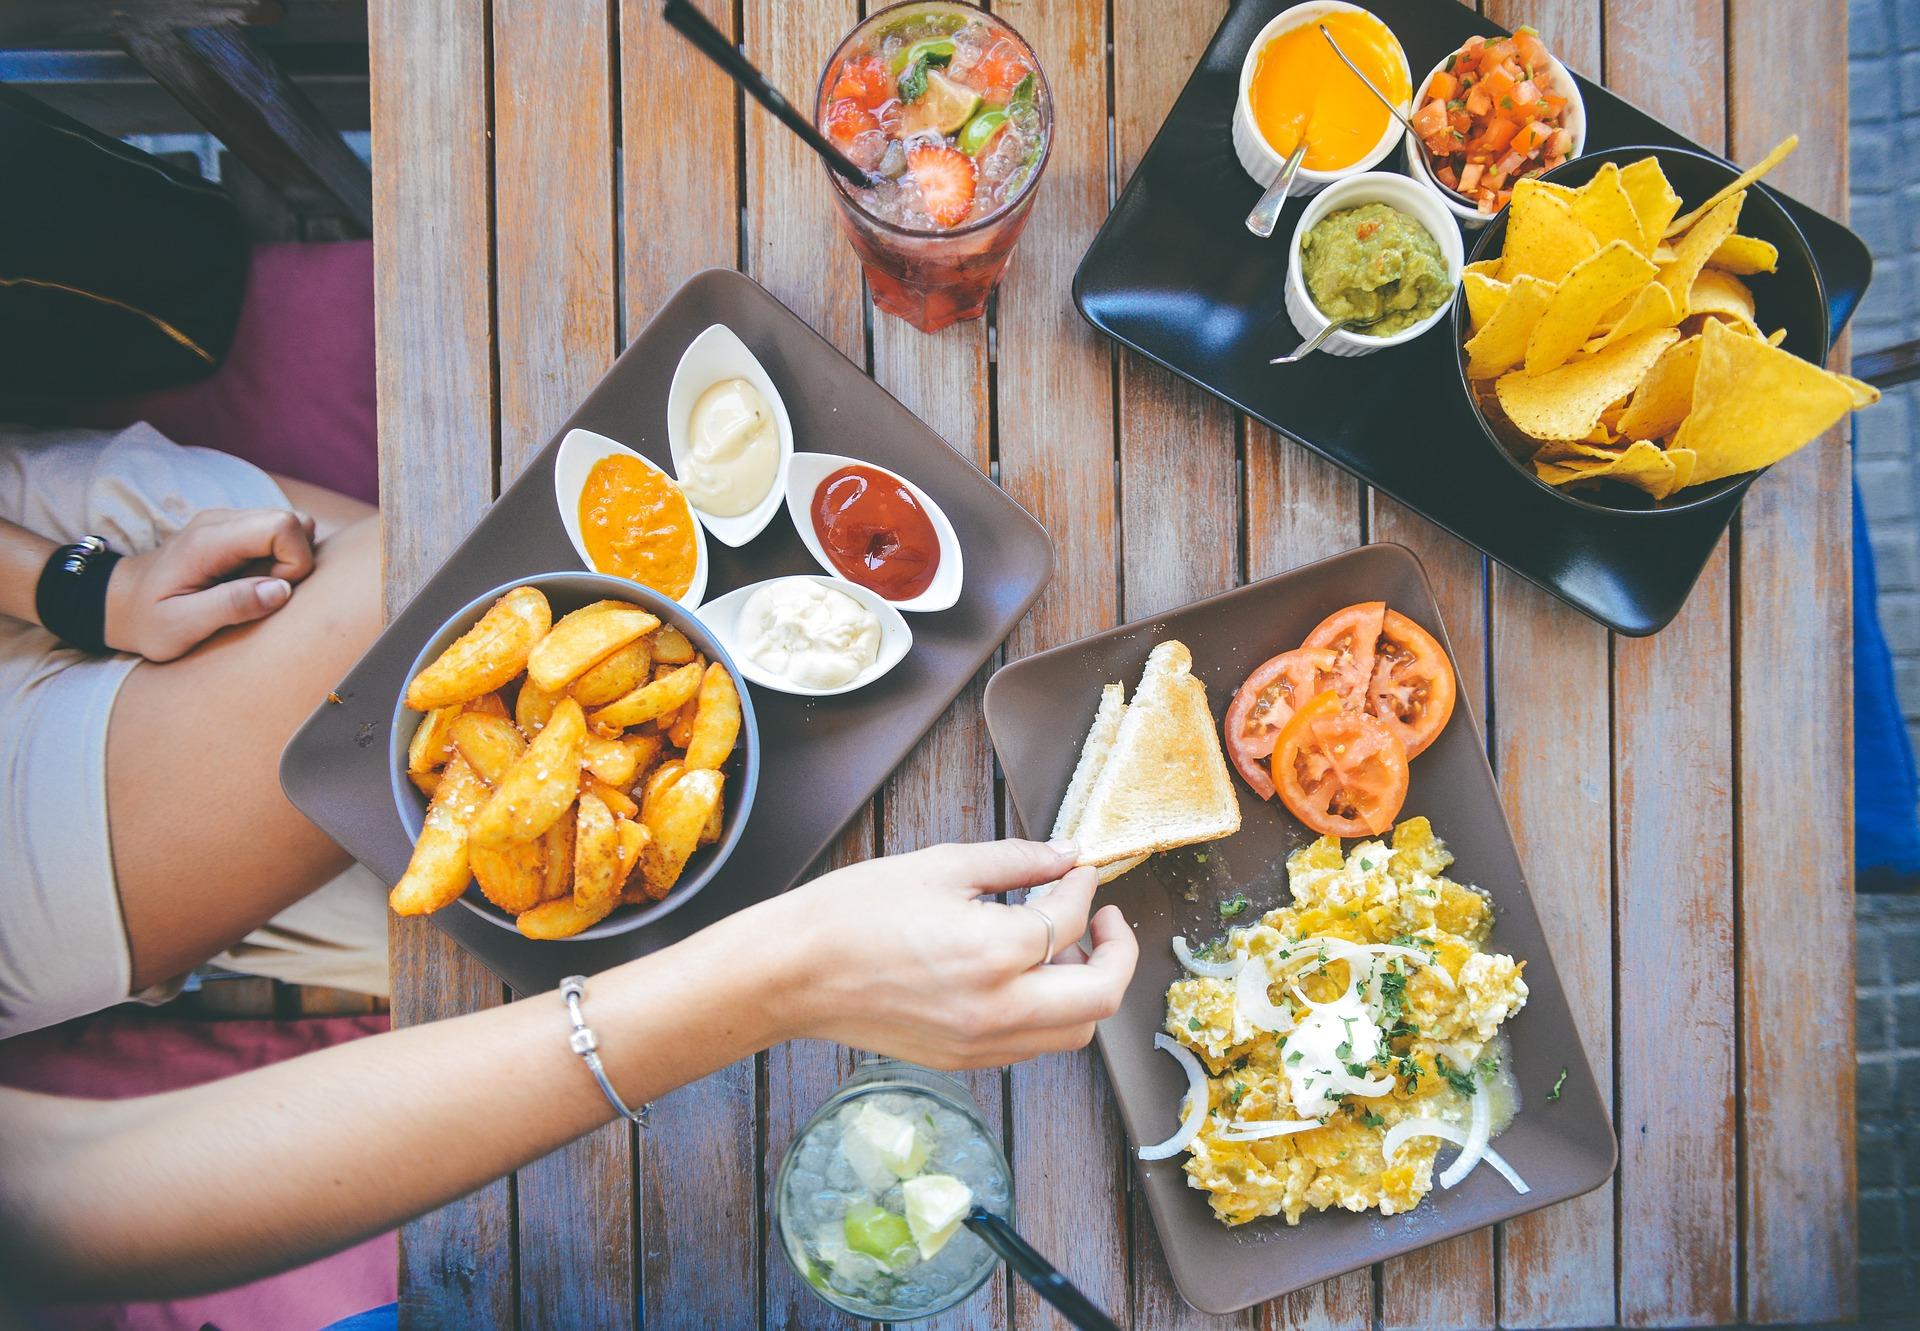 खाद्य, तालिका, restaurante, patatas, सॉस, पेय, sabroso, मेनू - HD वॉलपेपर - प्रोफेसर-falken.com